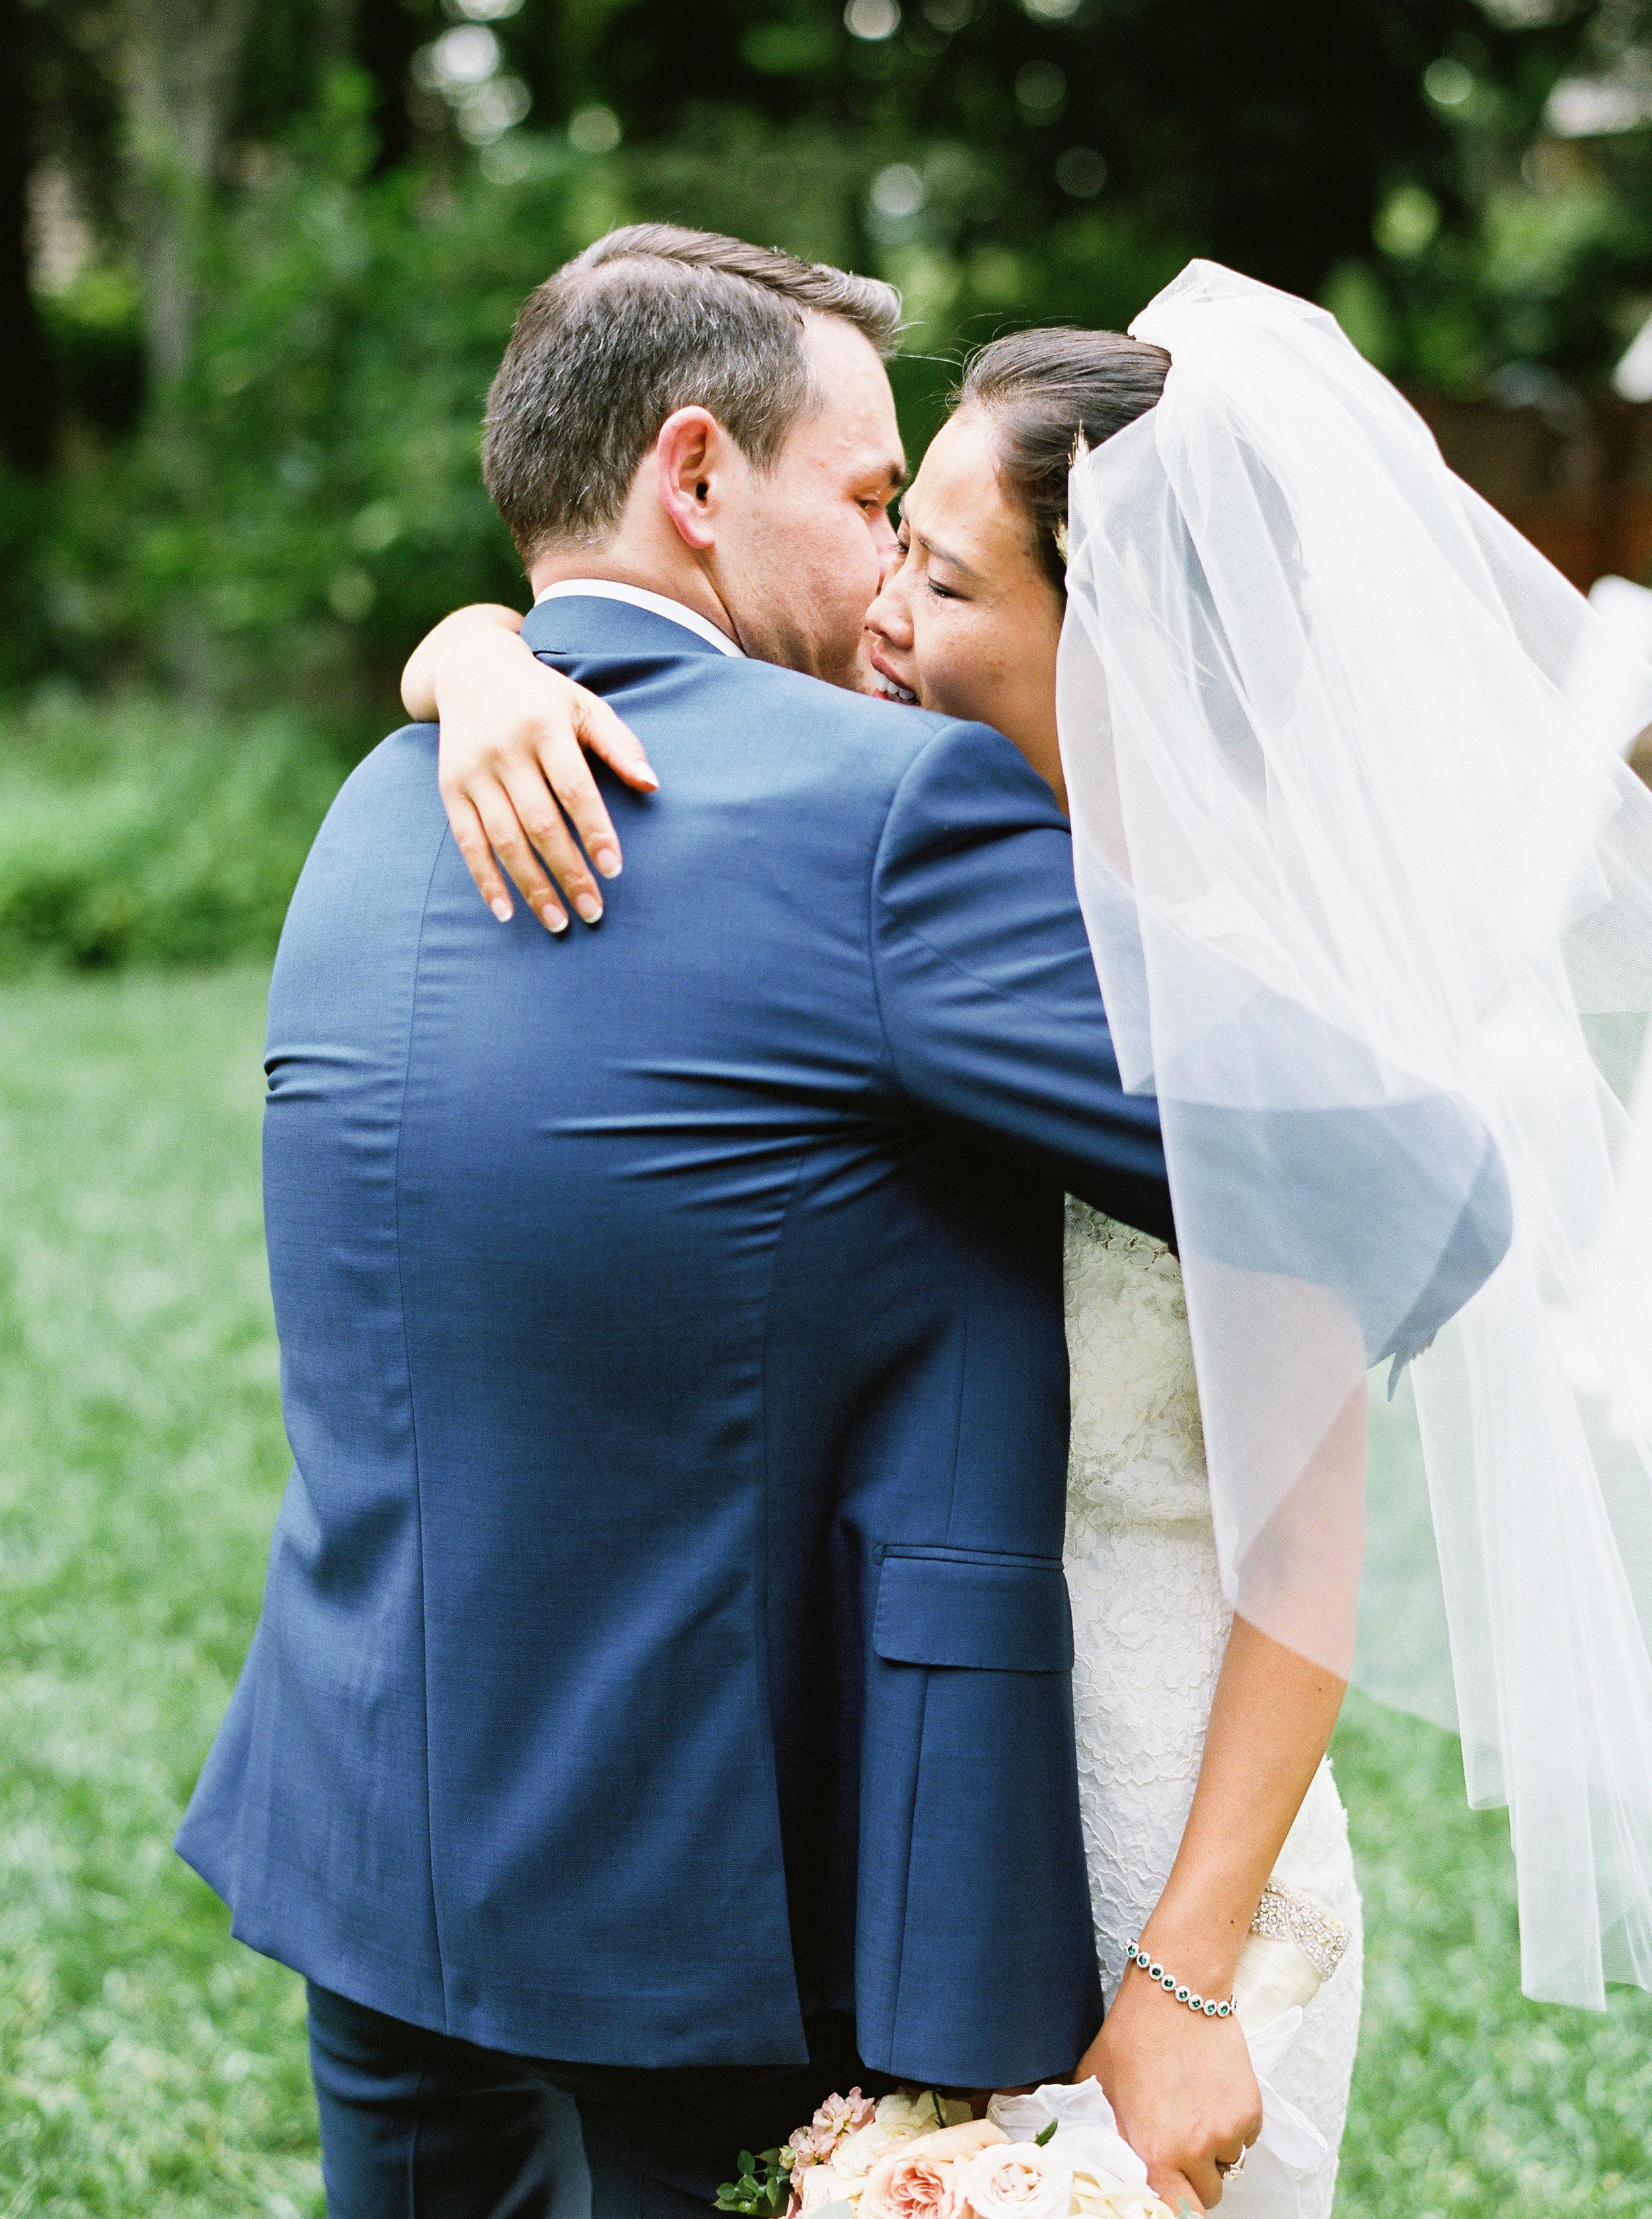 Harvest-inn-wedding-in-napa-california-84.jpg